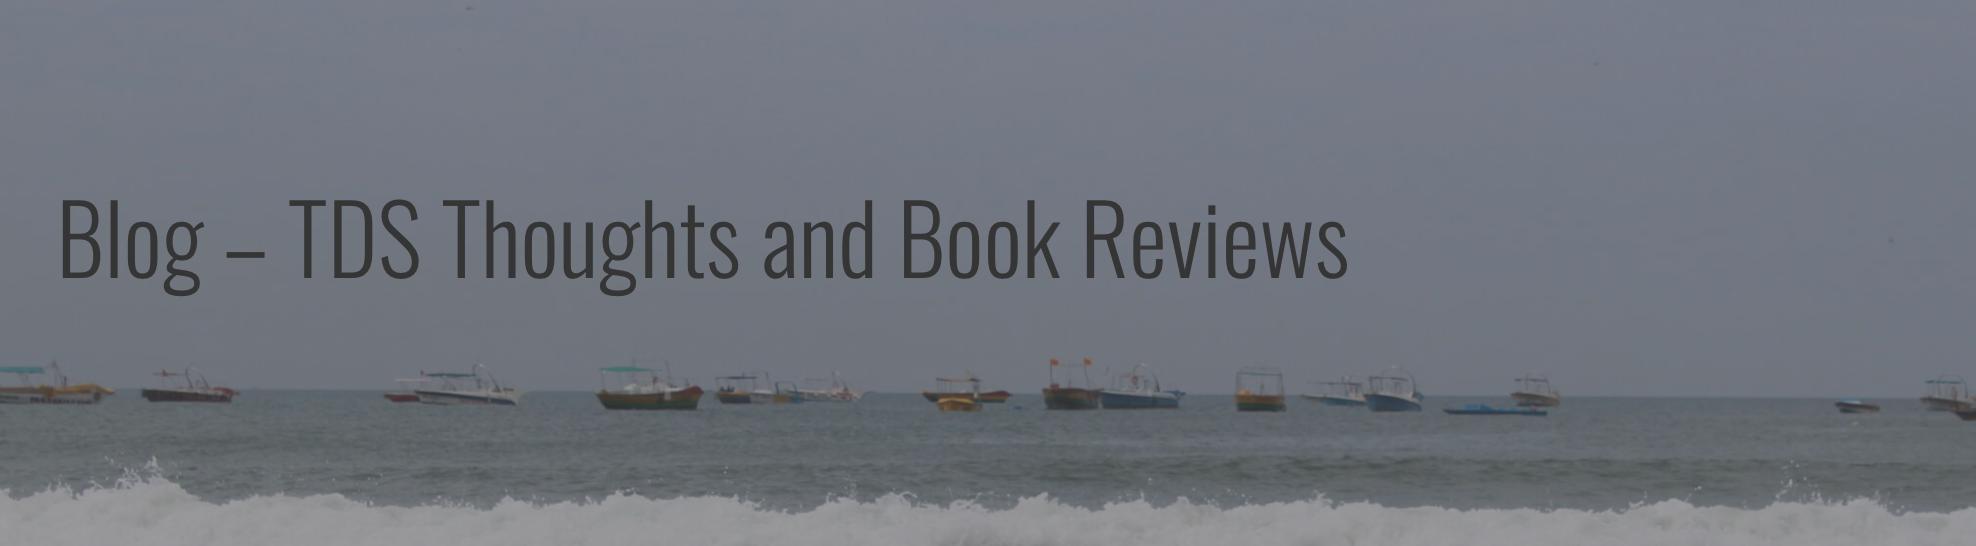 Book review of Divyastra by blogger Taru